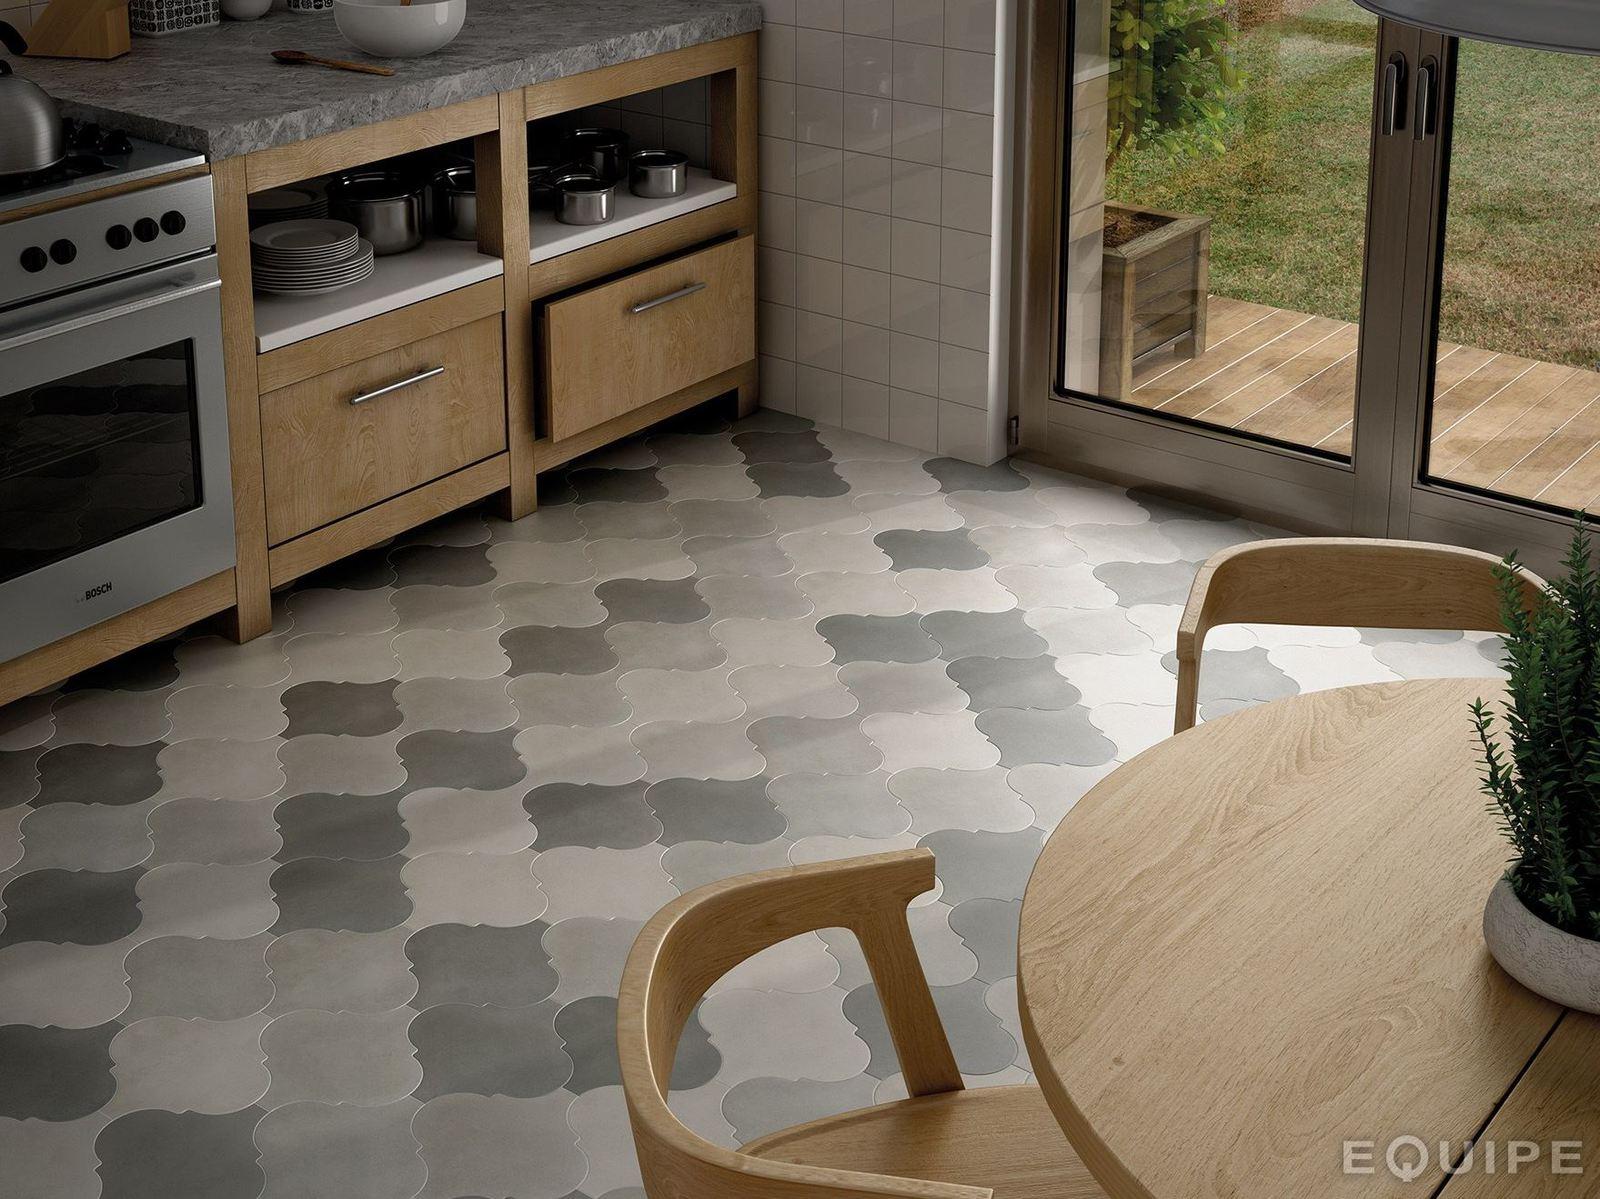 21 Arabesque Tile Ideas for Floor Wall and Backsplash